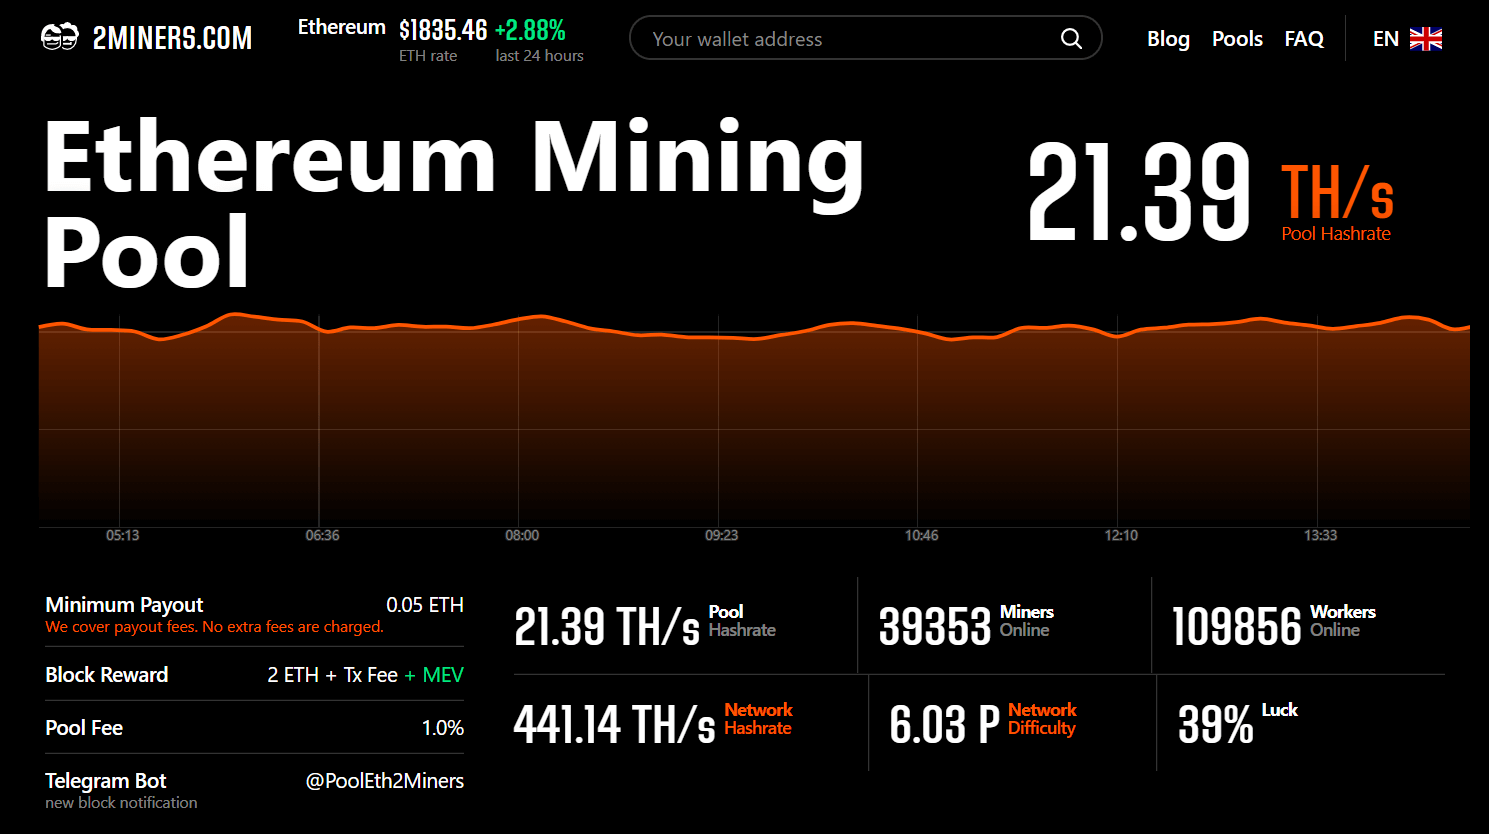 eth-mining-pool-hashrate-june